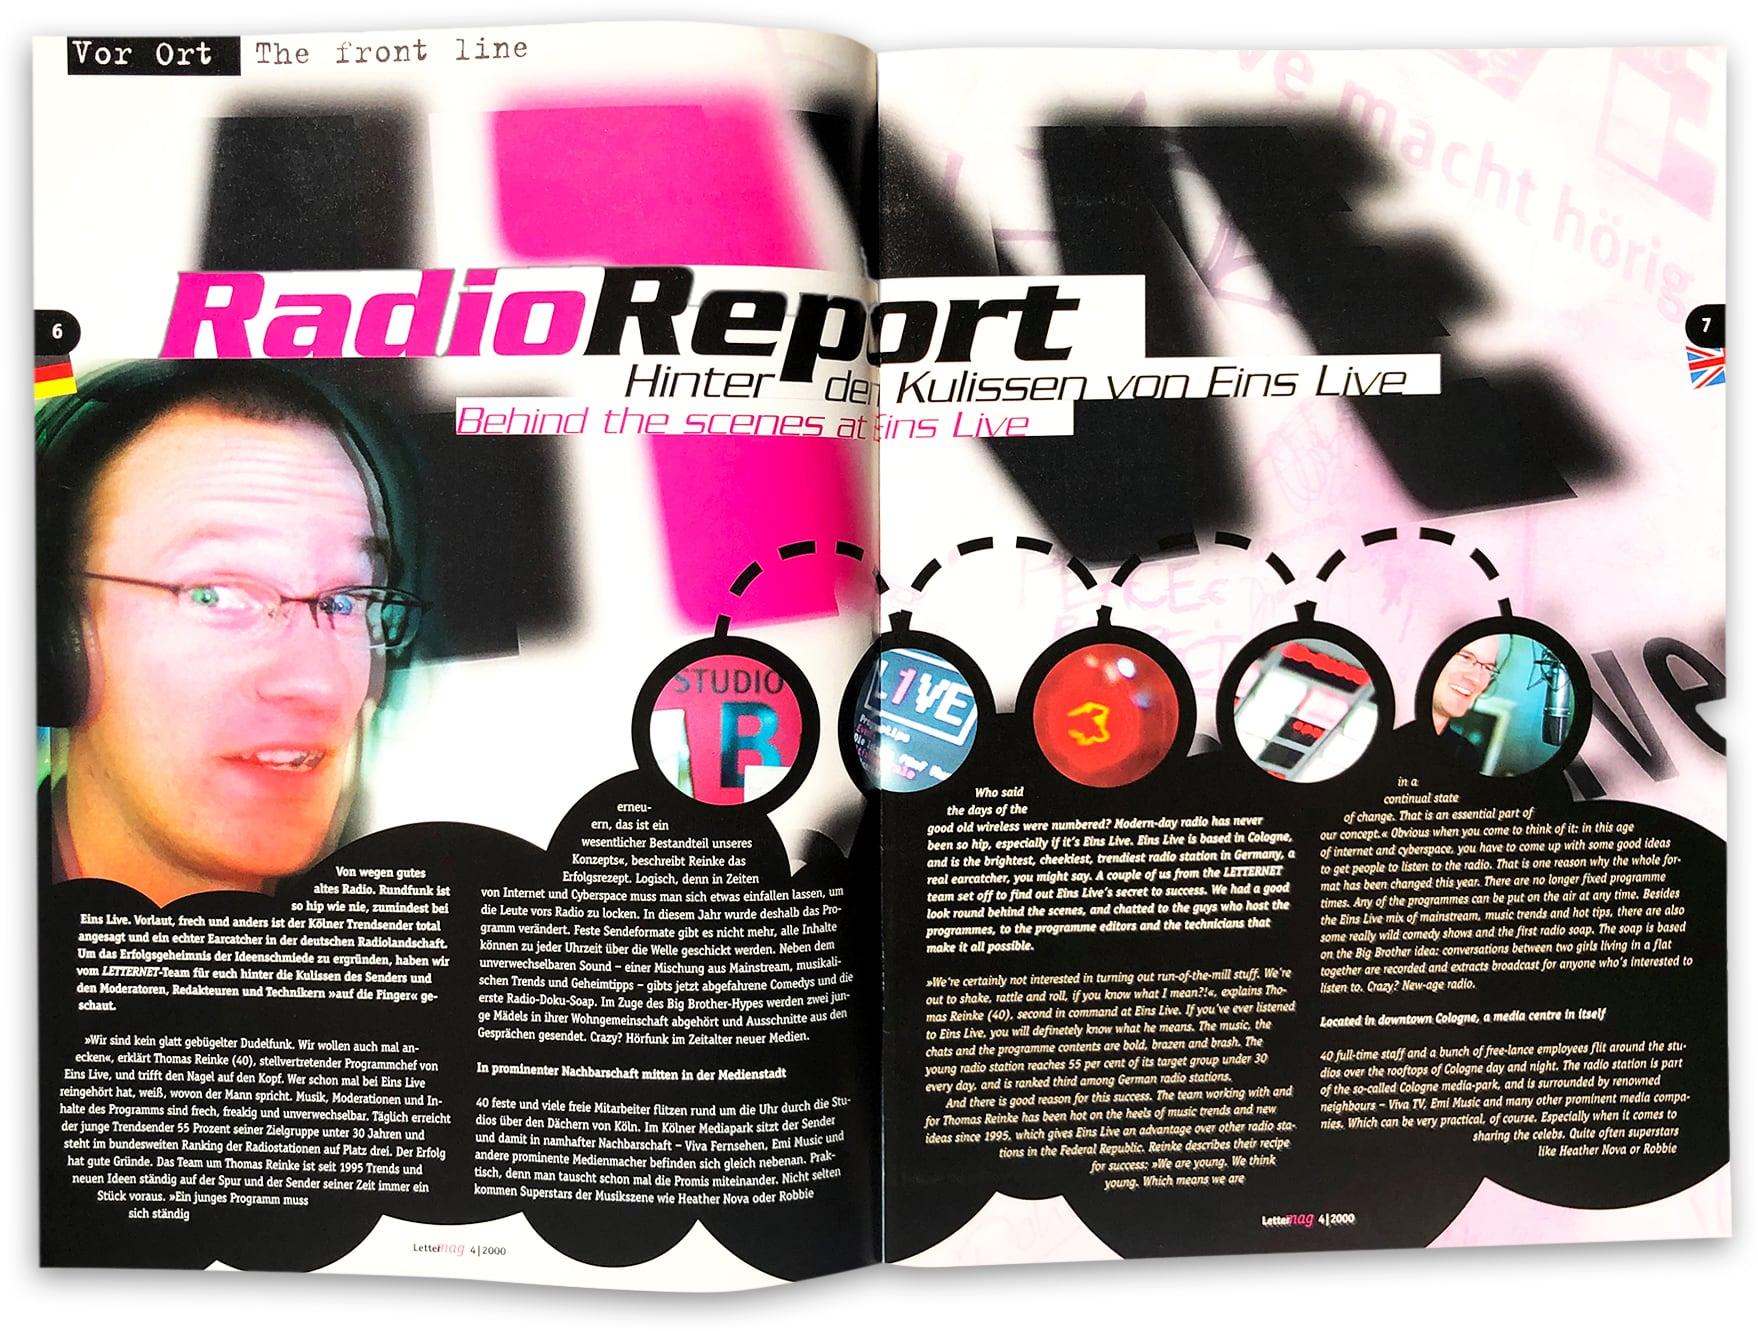 doppelseite Lettermag 1Live Radio report